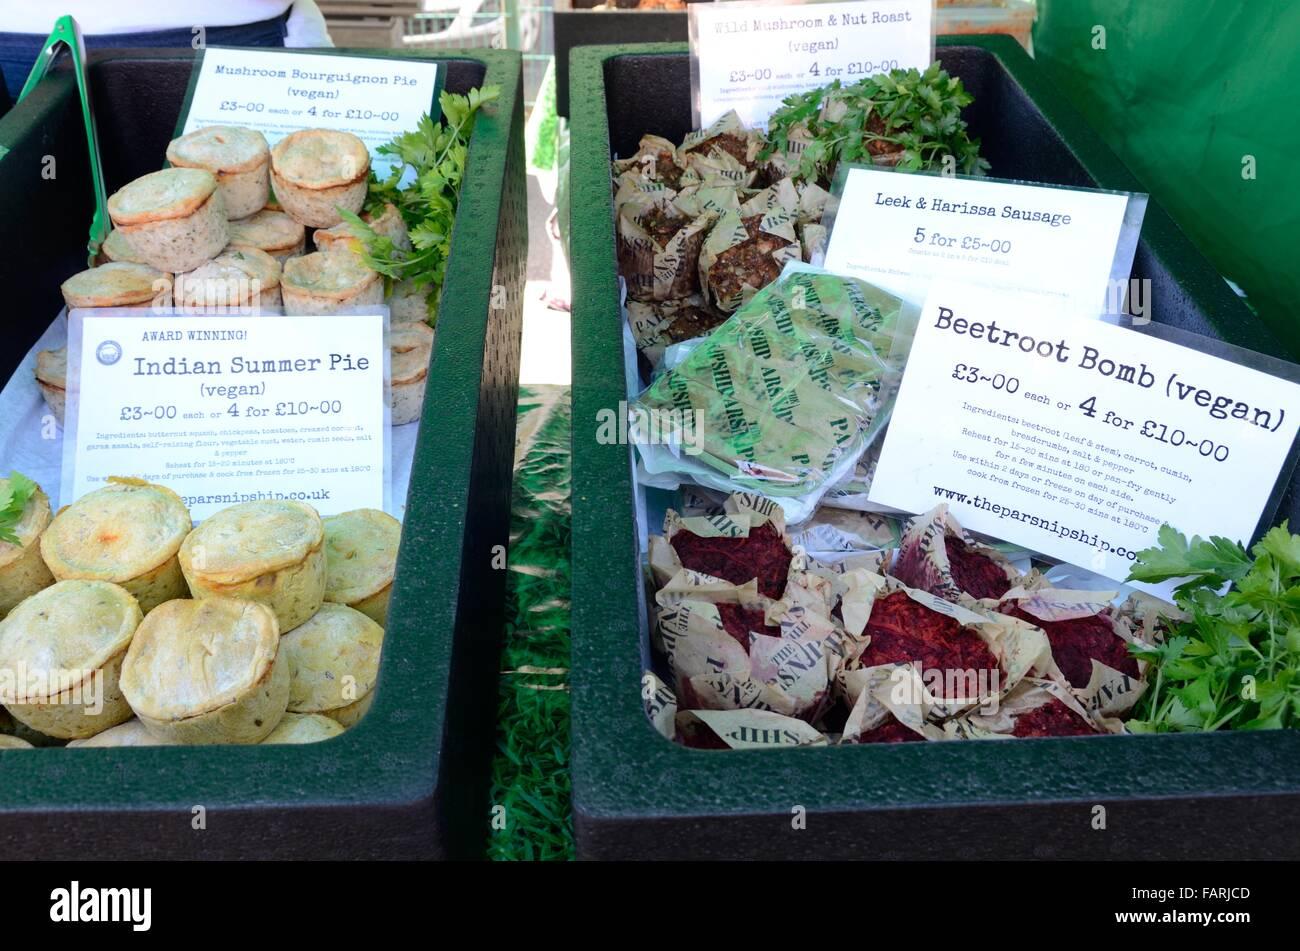 a selection of vegan and vegetarian food Narberth Food Festival Pembrokeshire Wales Cymru UK GB - Stock Image